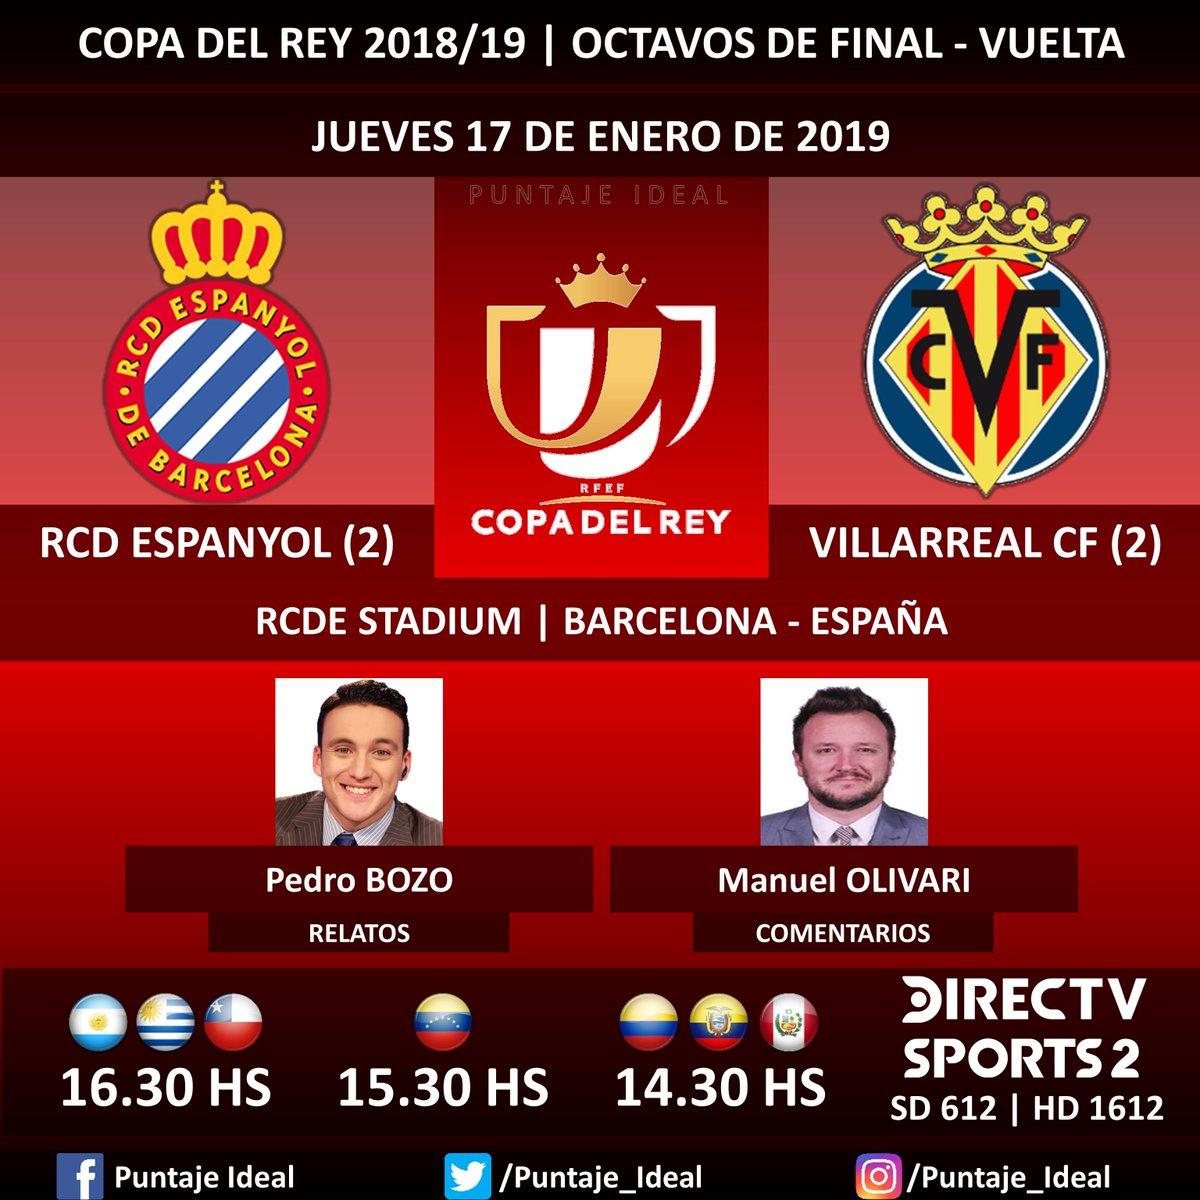 ⚽ #FútbolEnDIRECTV   #RCDEspanyol vs. #VillarrealCF 🎙 Relatos: @pedrobozoa  🎙 Comentarios: @ManuOlivari  📺 TV: @DIRECTVSports 2 Sudamérica (612 - 1612 HD) - #Torneos 🤳 #SoySportista - #CopaDelRey 🇪🇸 - #EspanyolVillarreal  Dale RT 🔃